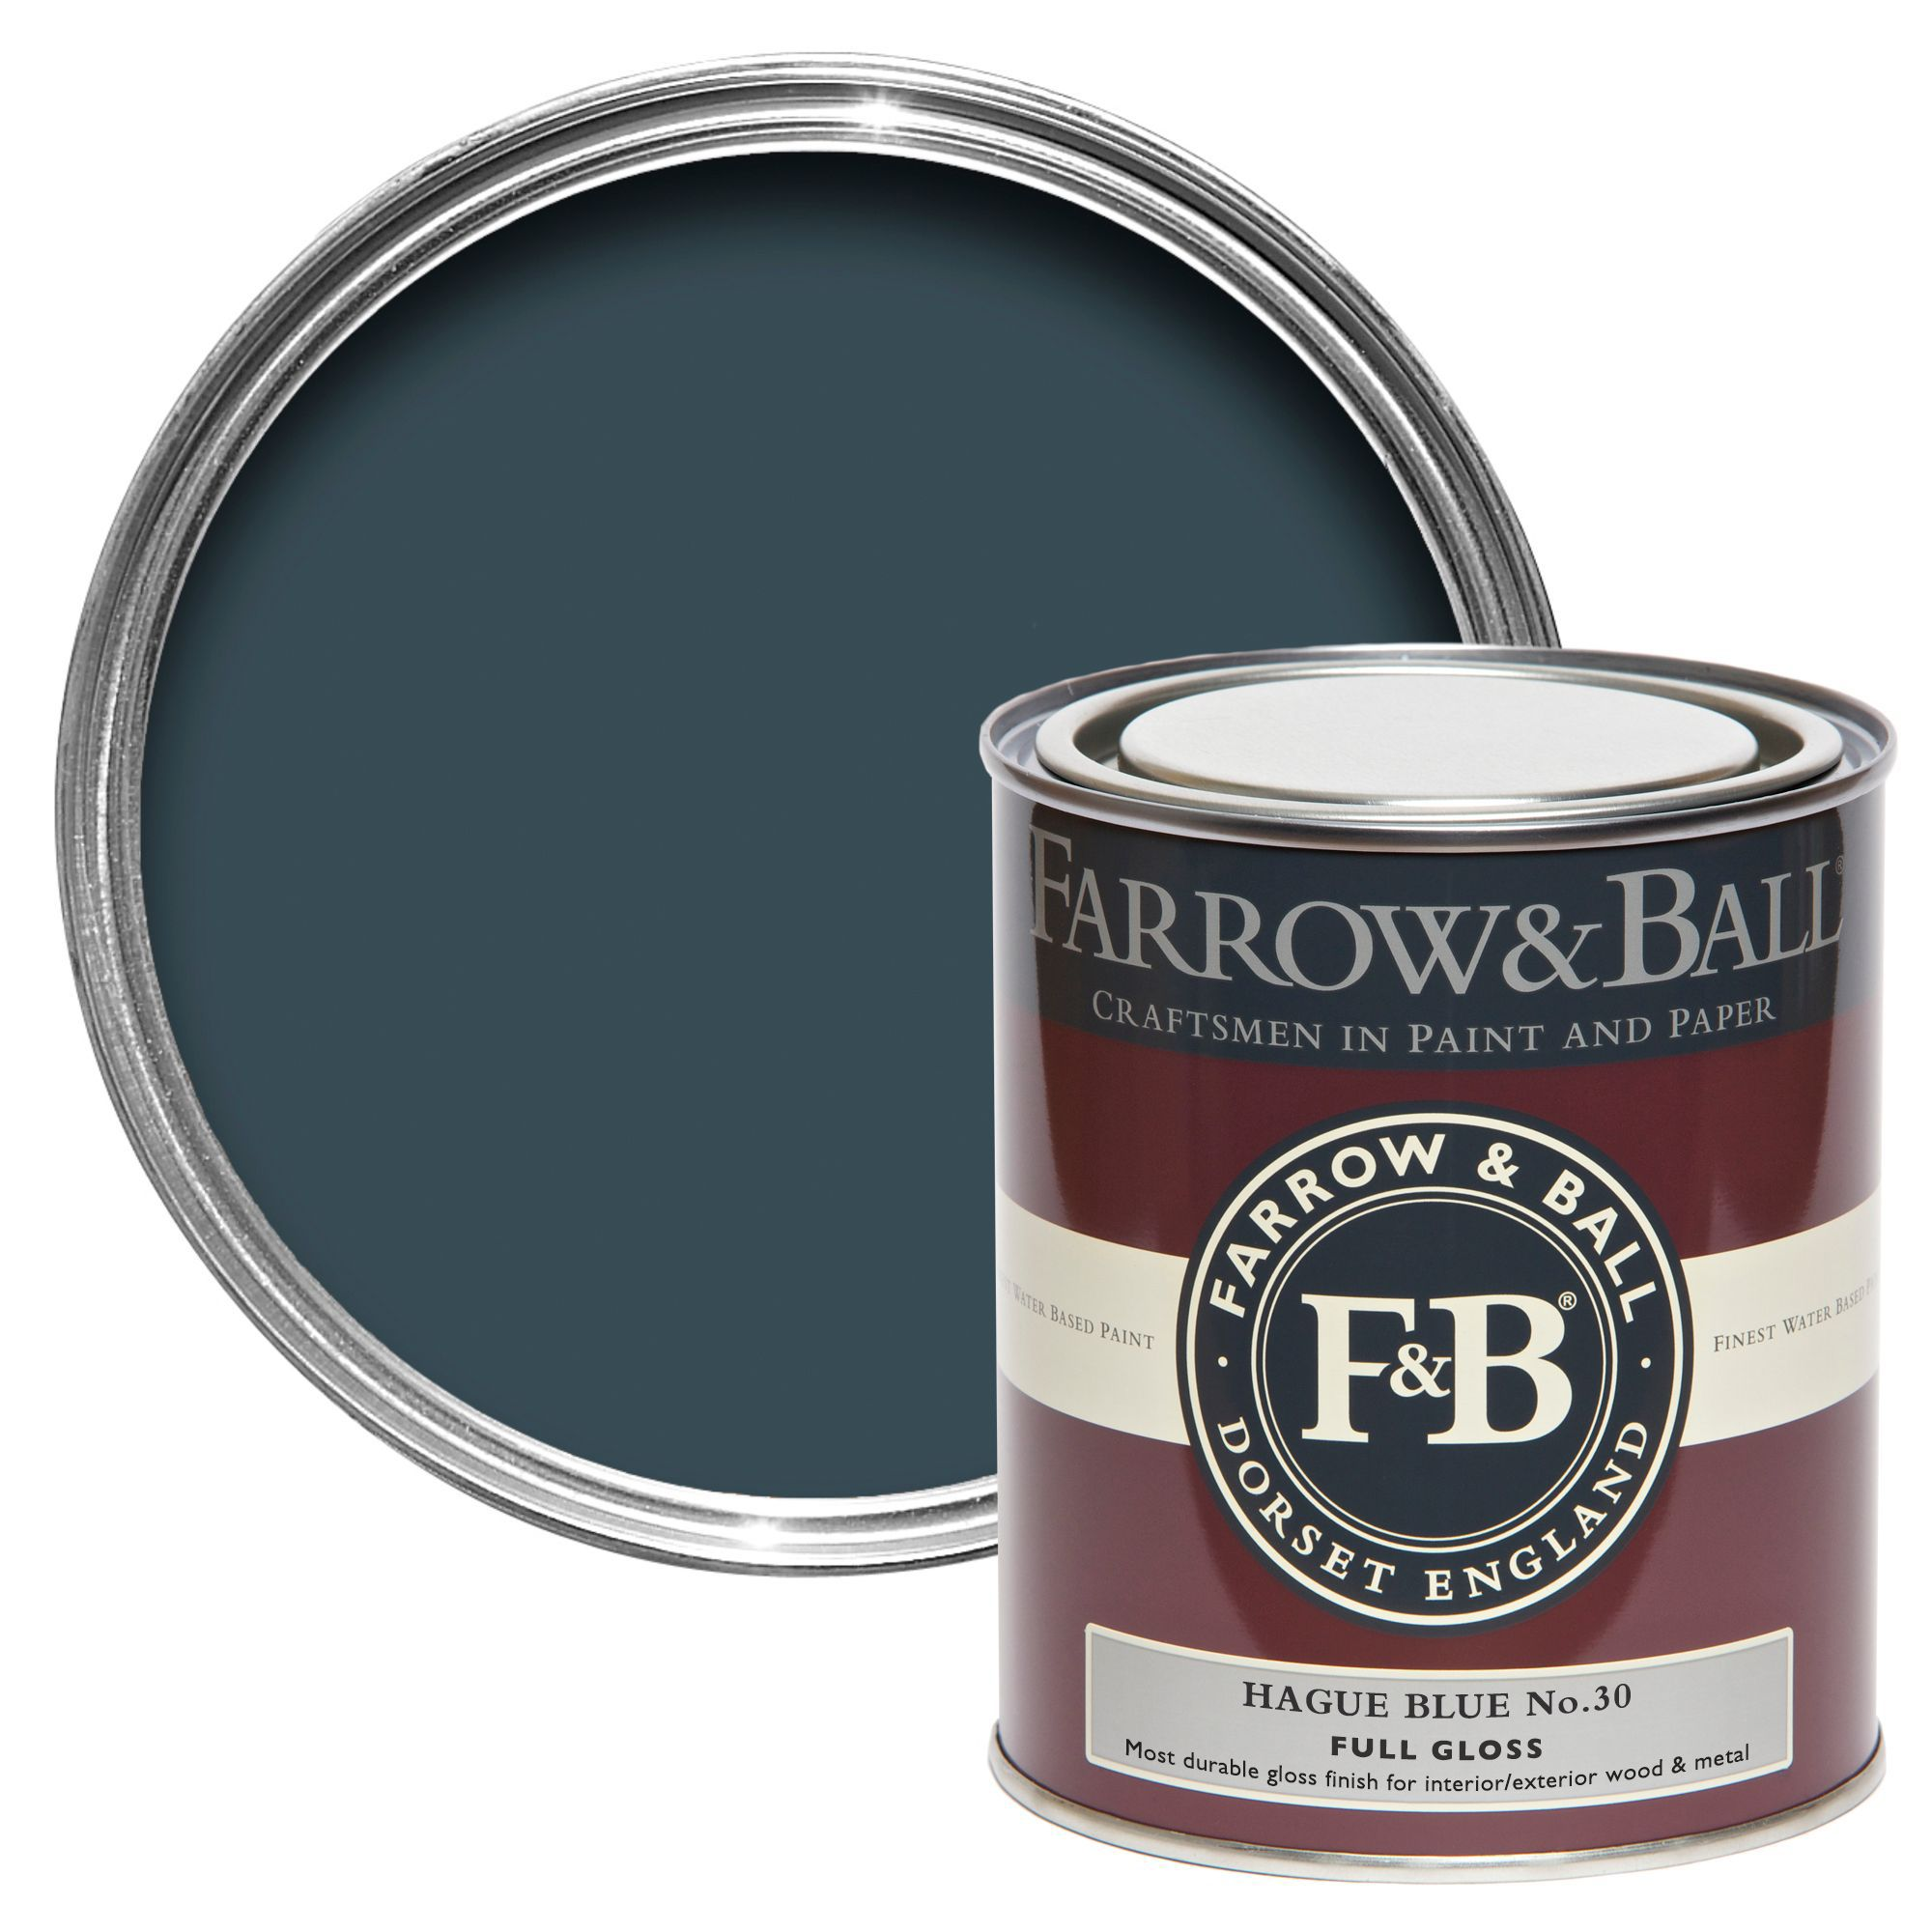 Farrow Amp Ball Hague Blue No 30 Gloss Paint 0 75l